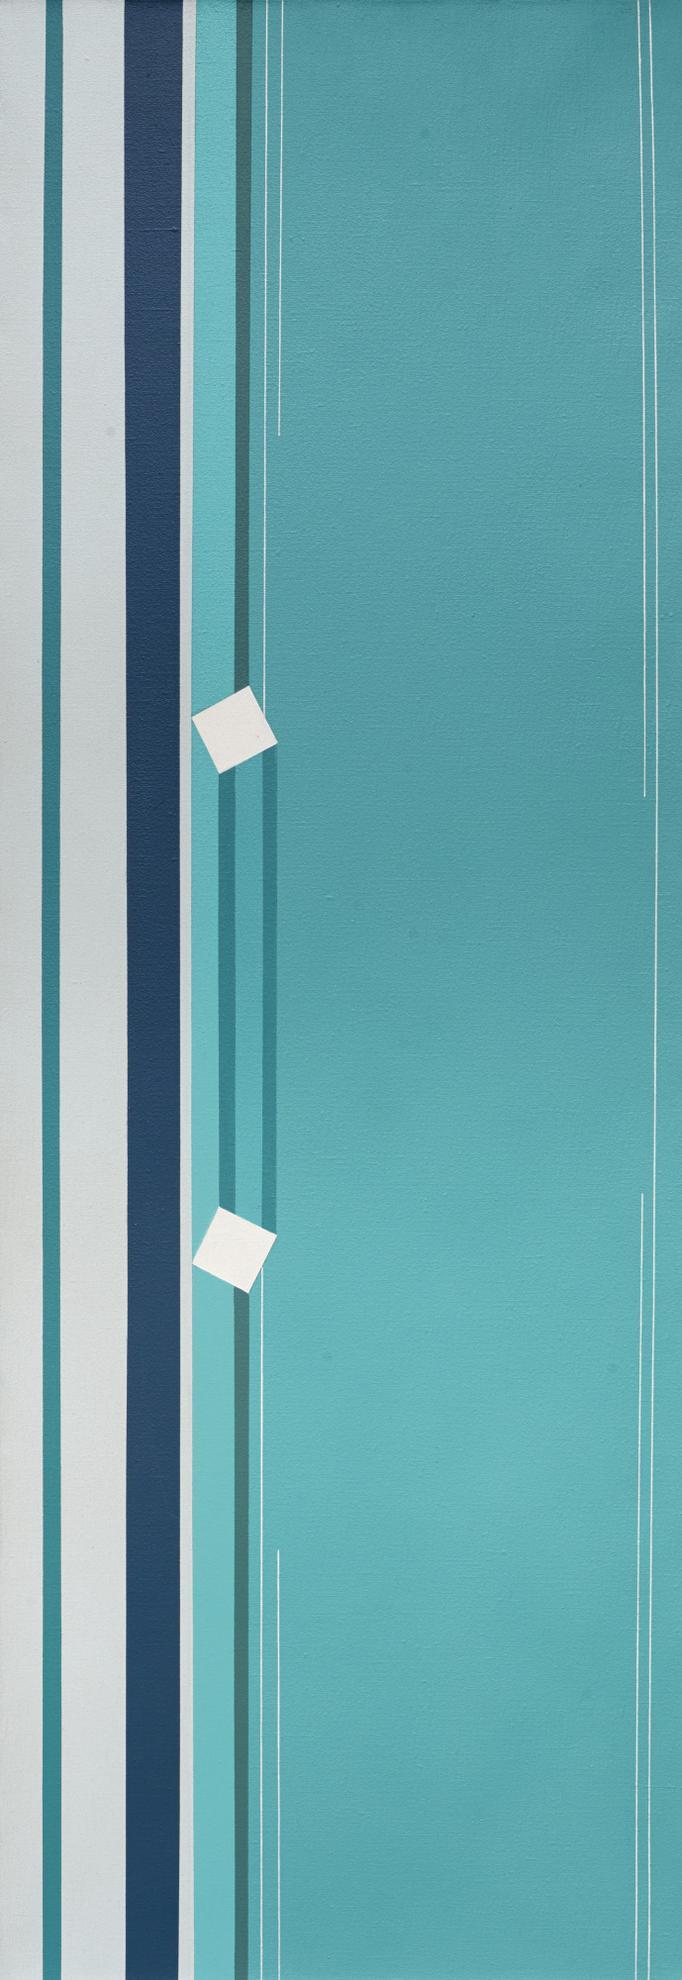 Lothar Charoux-Geometrico (Linhas)-1979